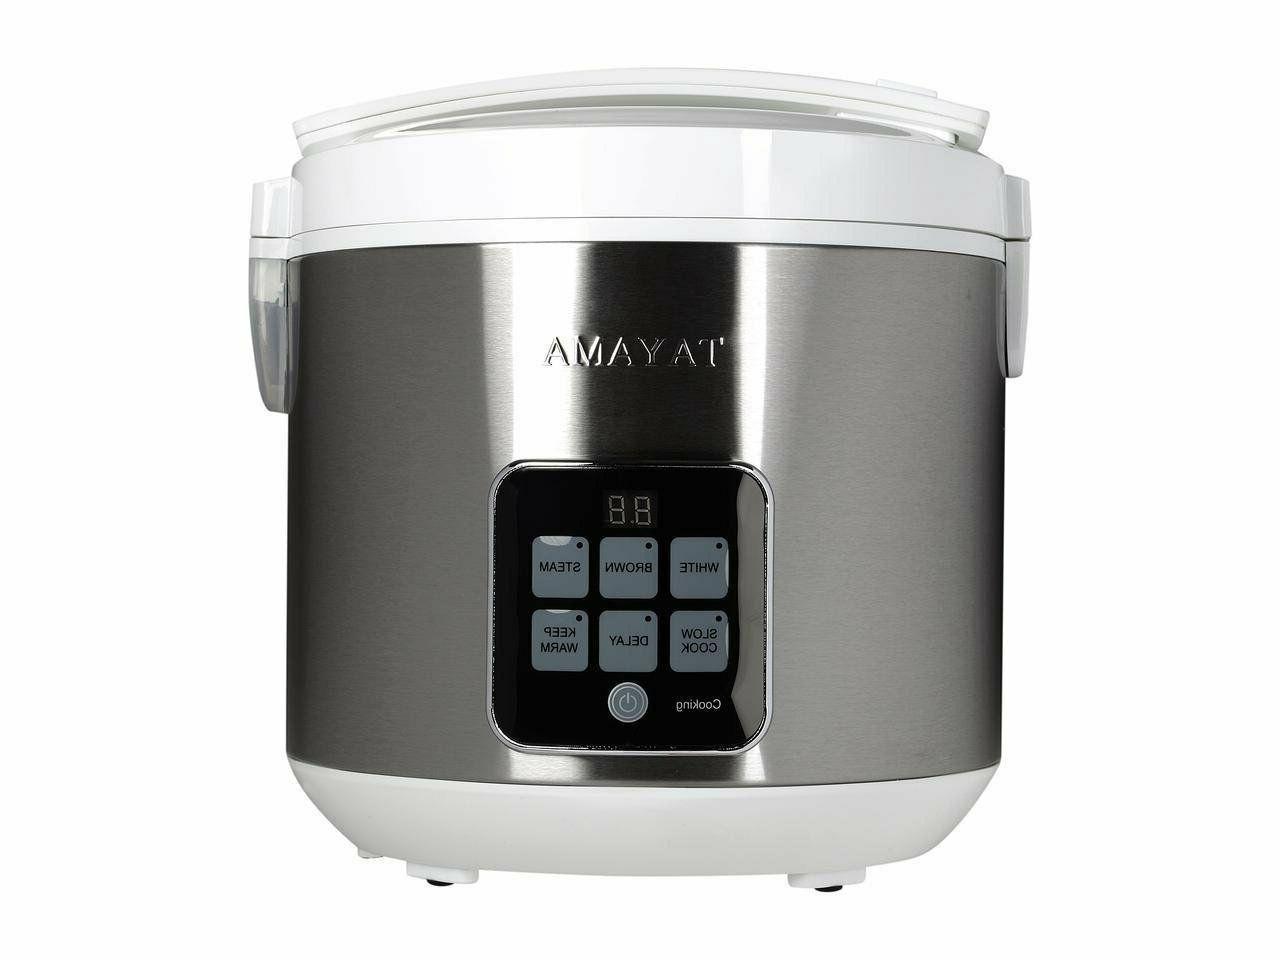 Tayama Cup Digital Rice Food Steamer, White